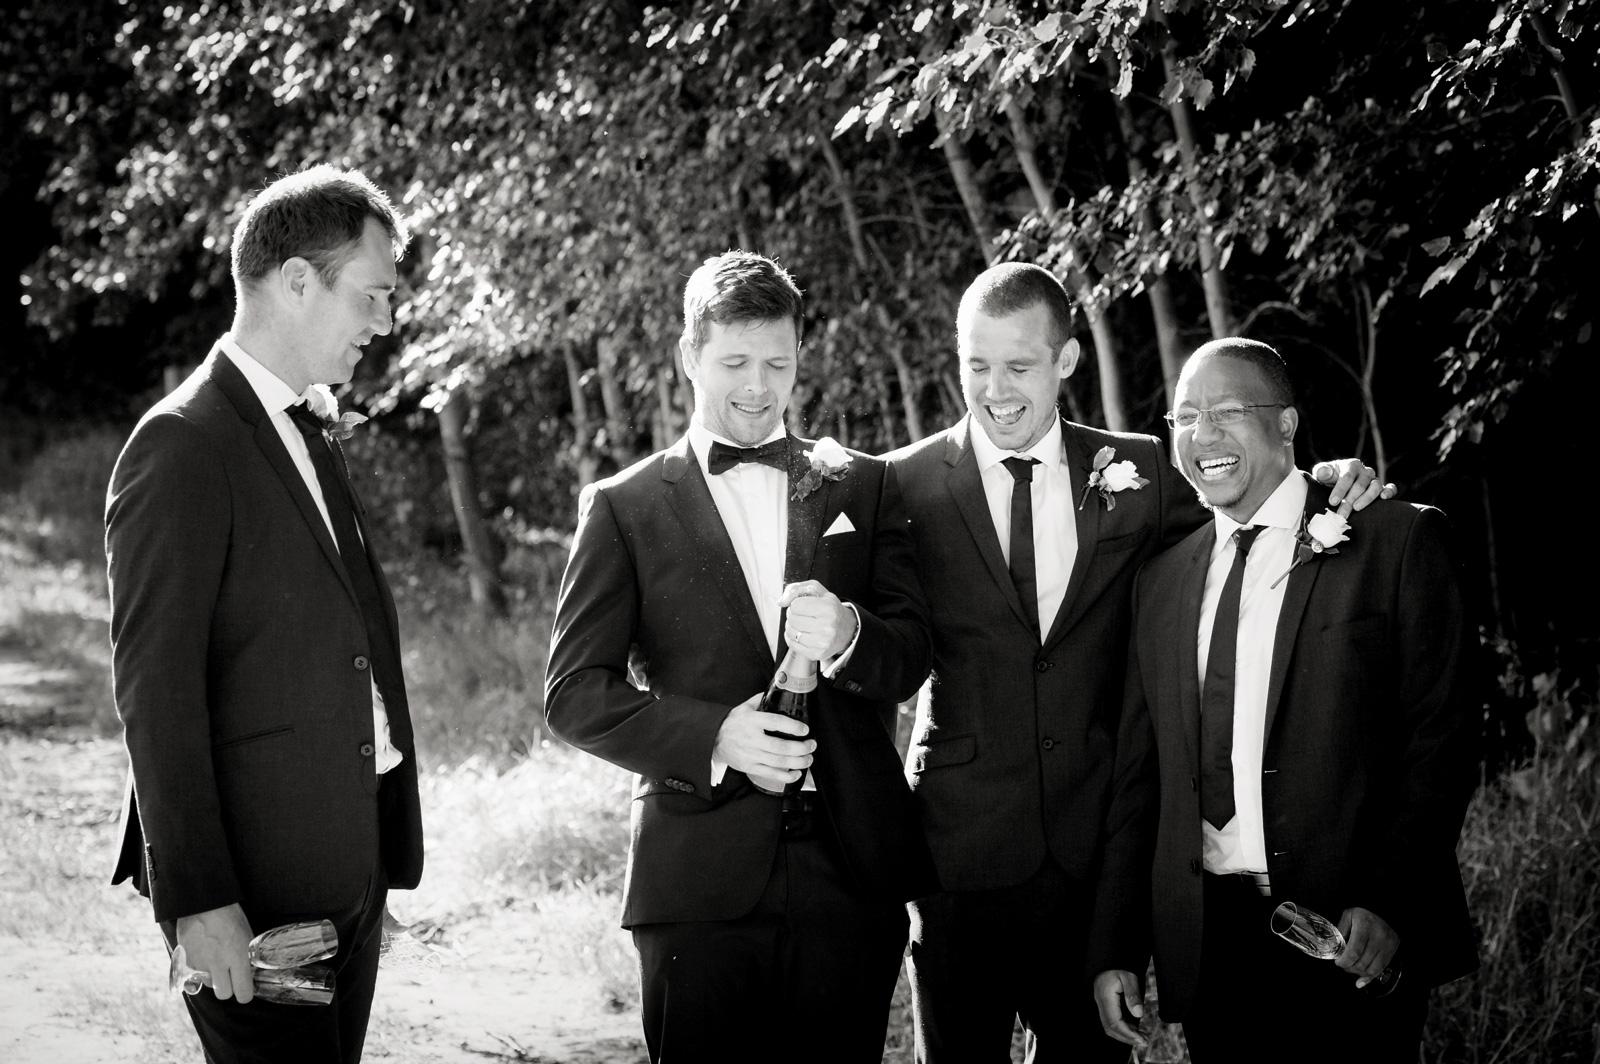 Men popping champagne